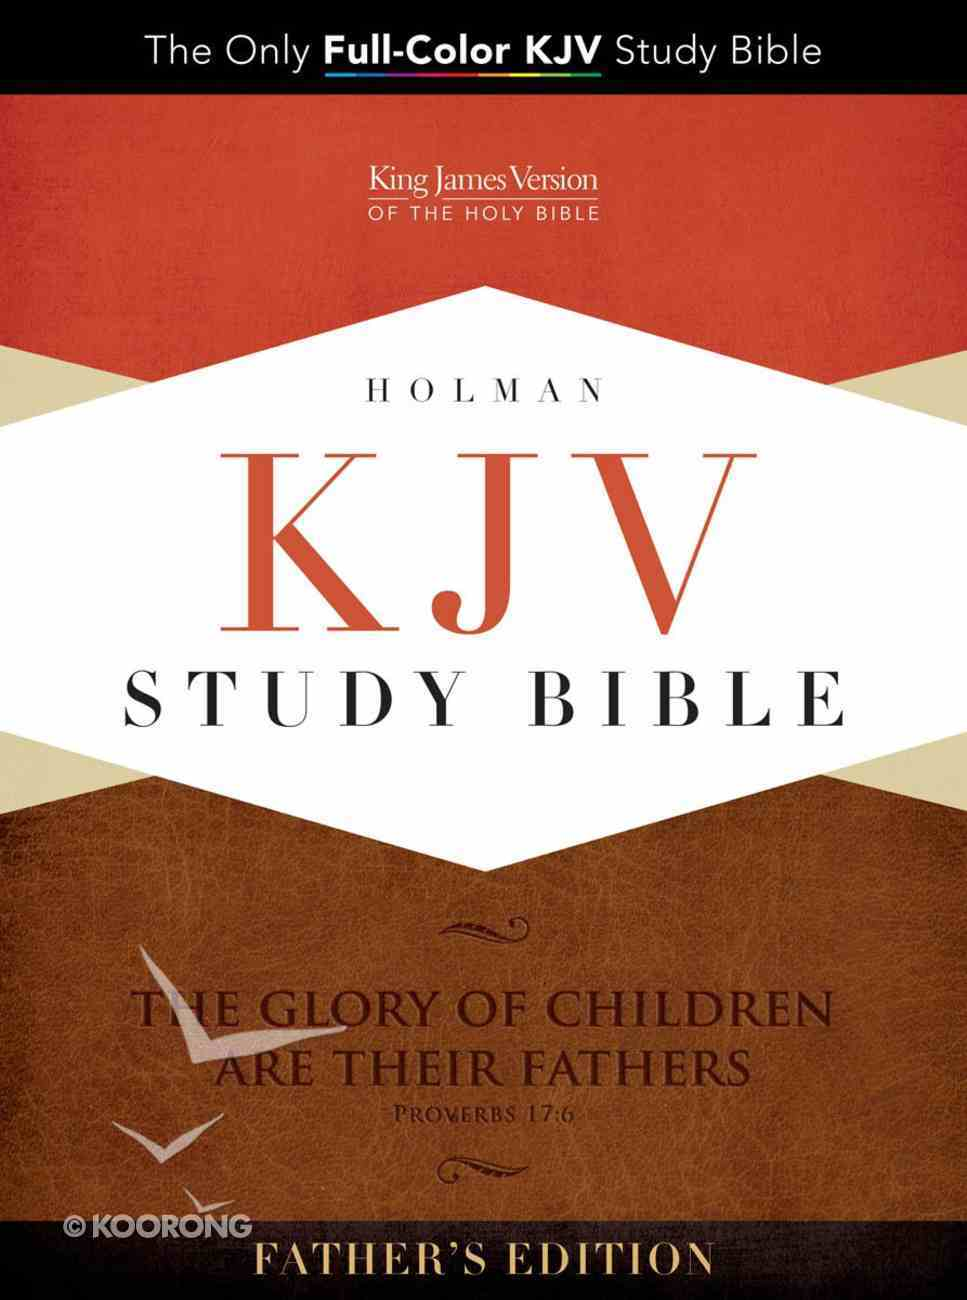 KJV Study Bible Father's Edition Black/Tan Imitation Leather